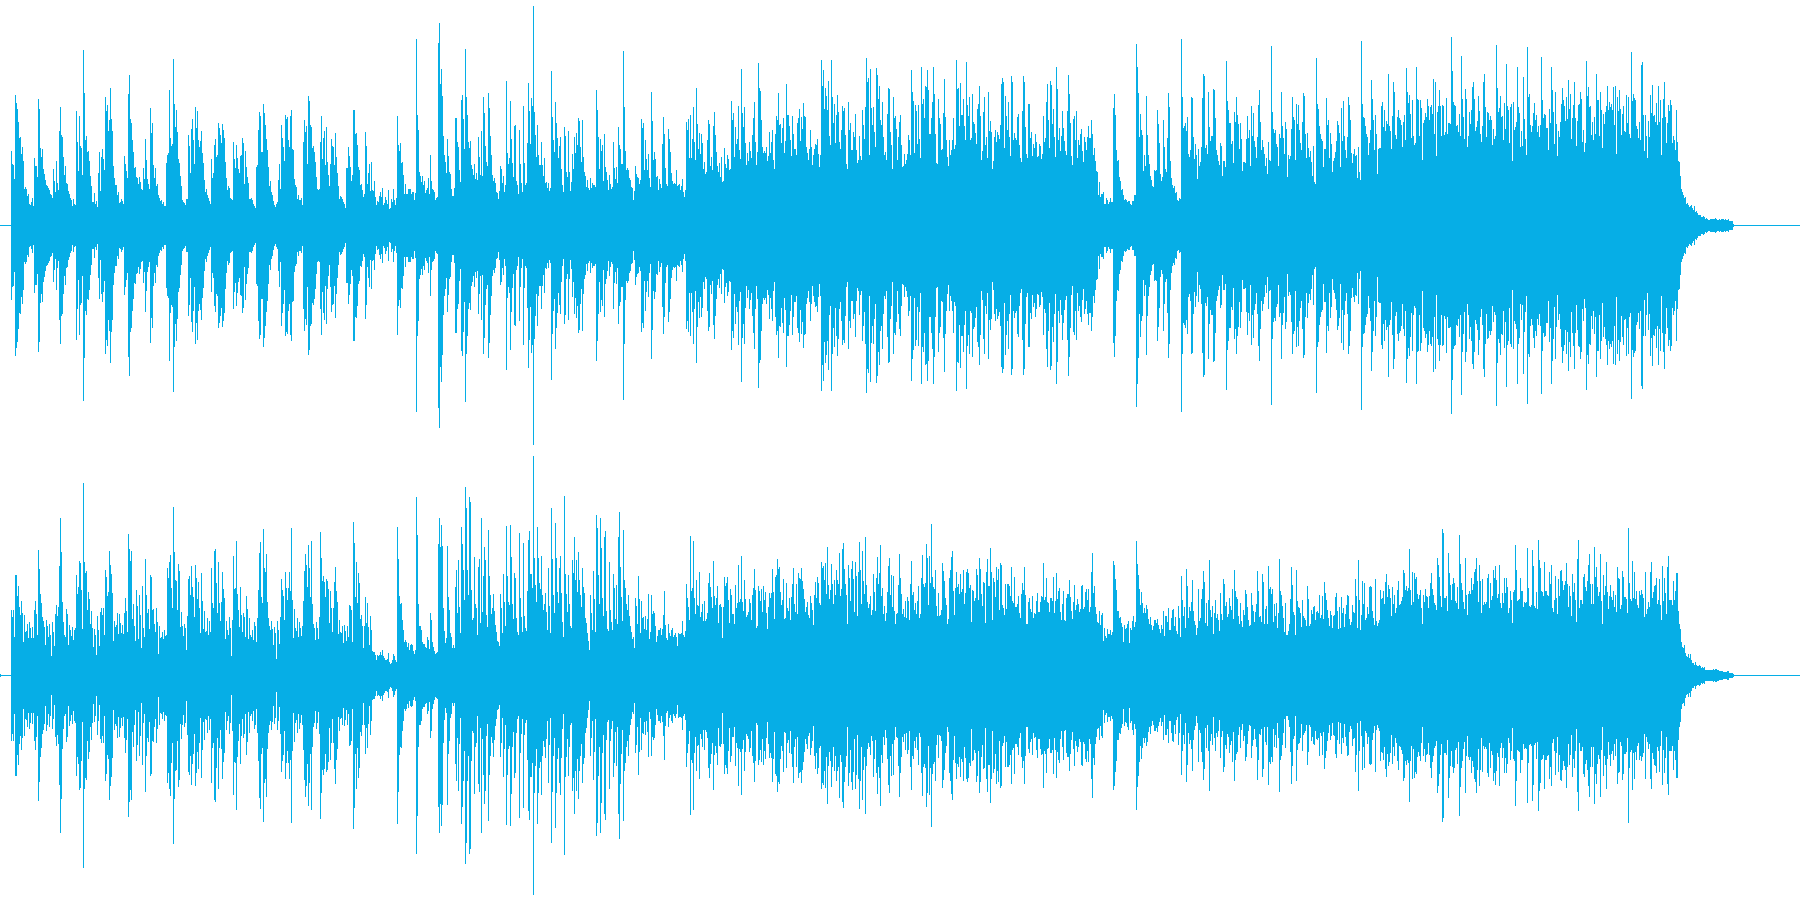 piano 音楽の再生済みの波形